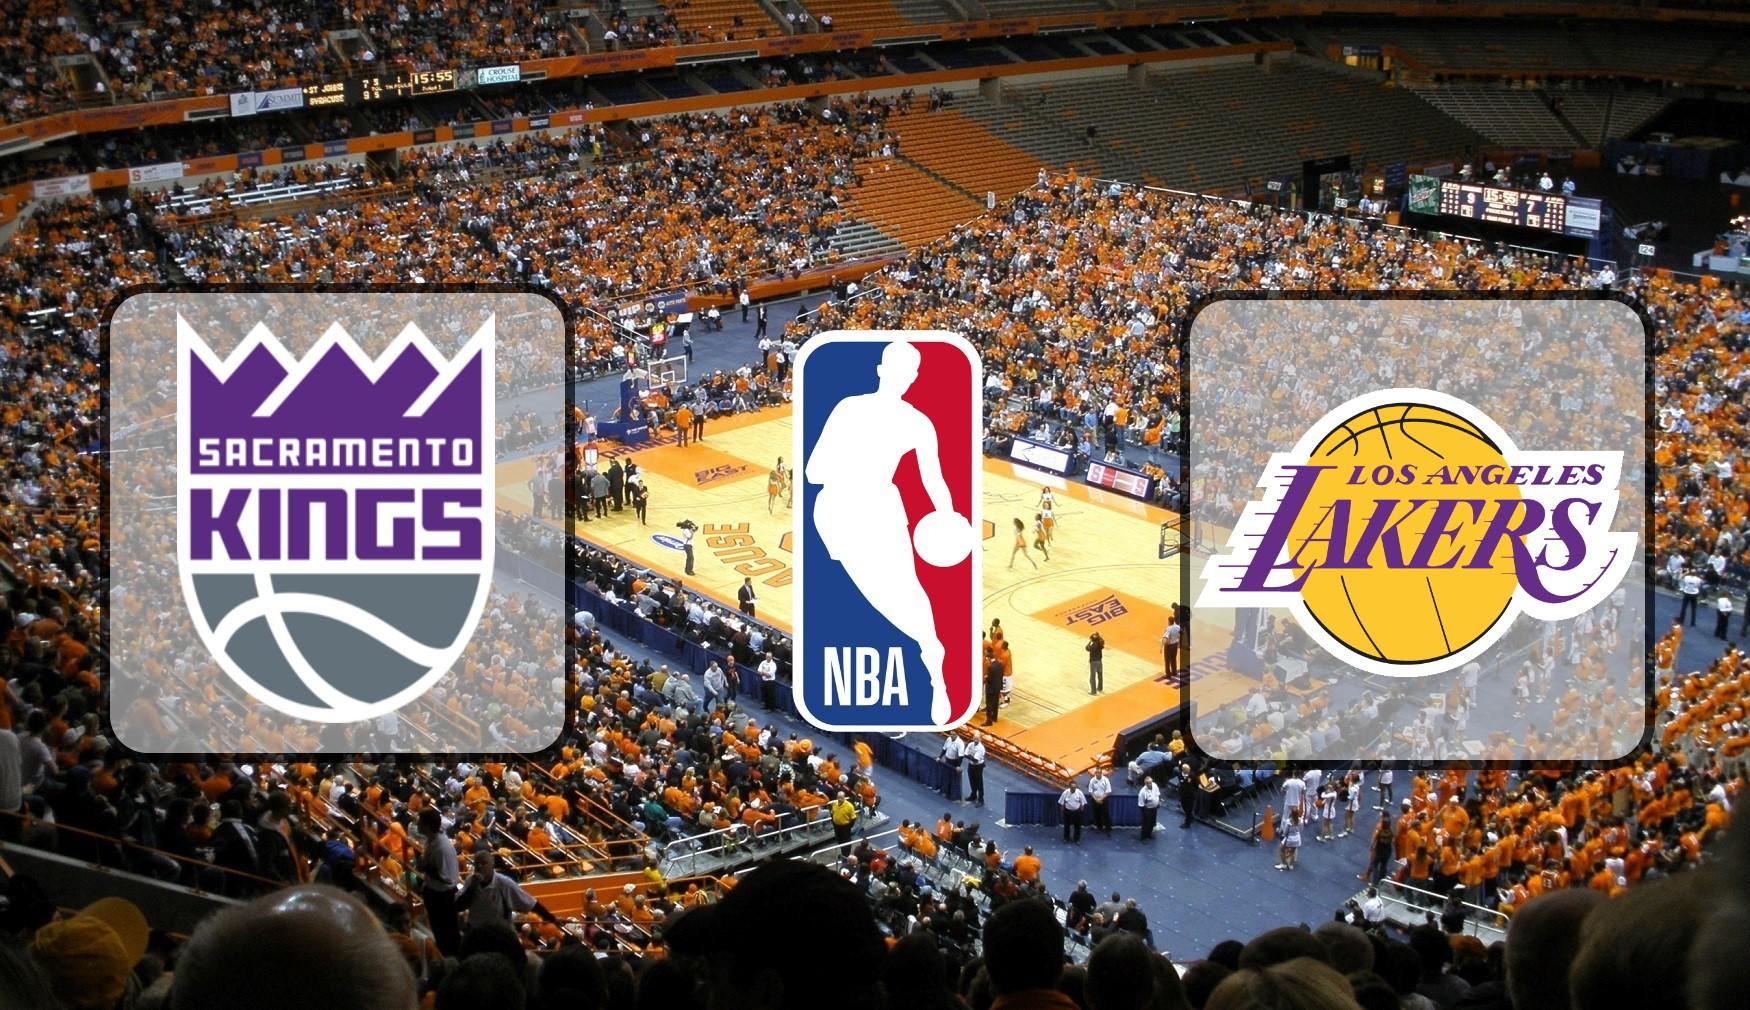 """Сакраменто Кингз"" – ""Лос-Анджелес Лейкерс"". Прогноз на матч НБА 11.11.2018"